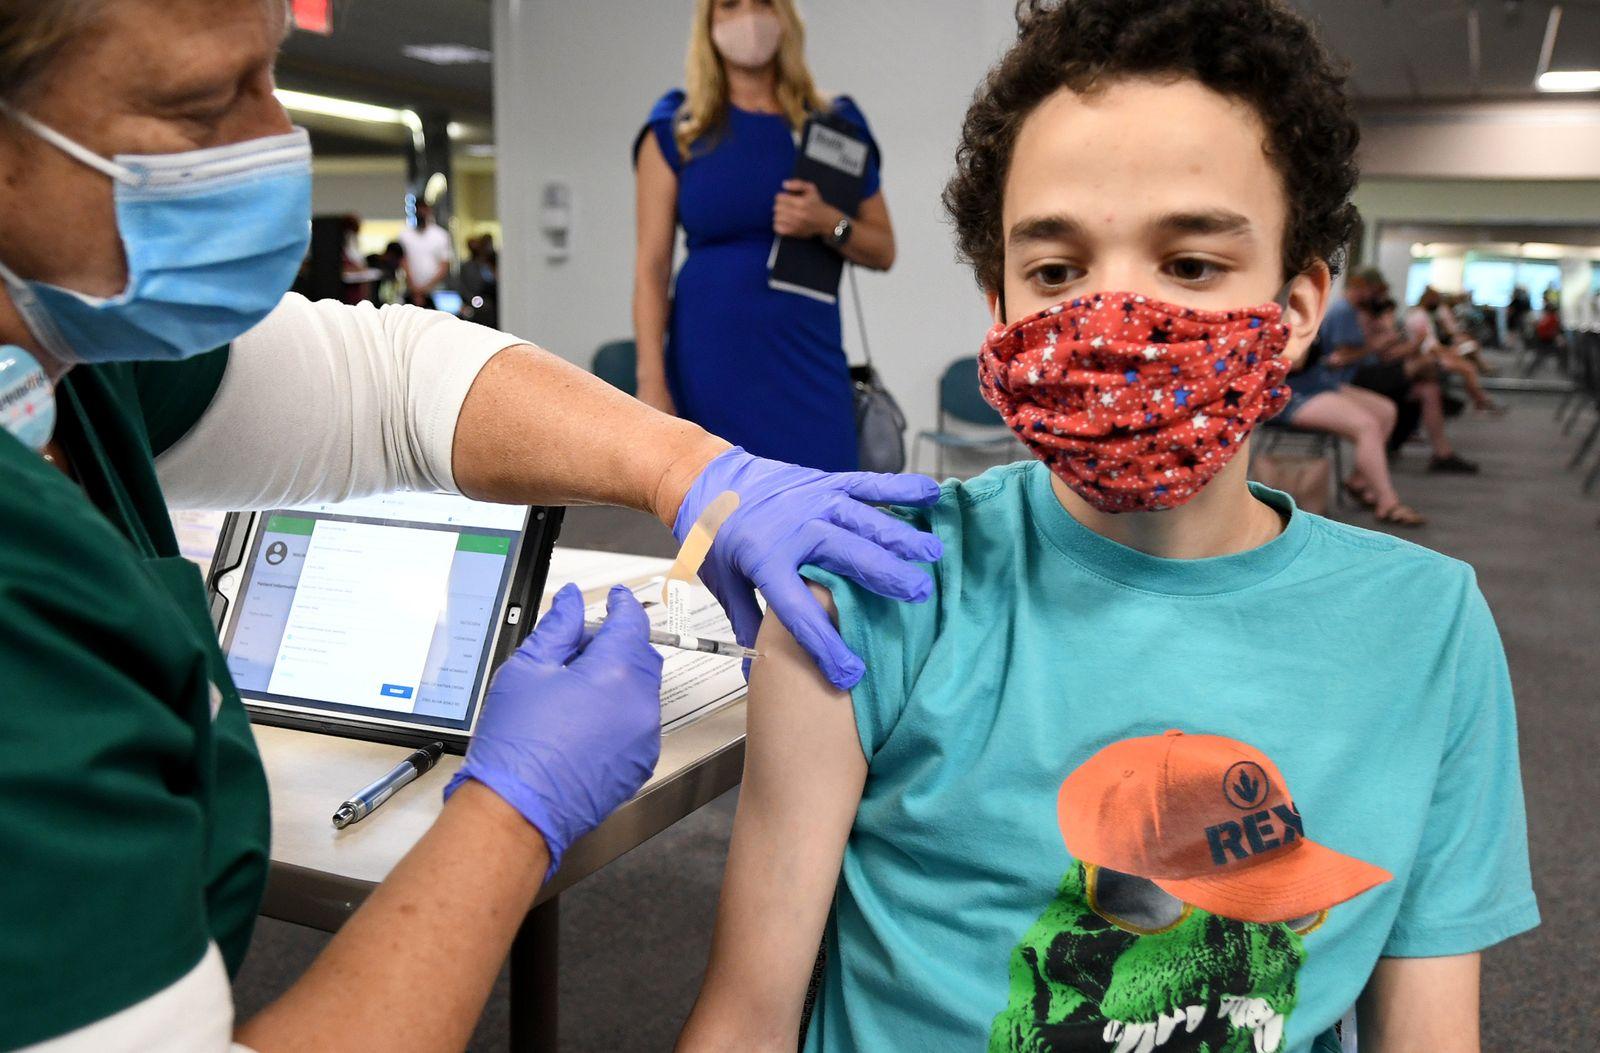 A nurse gives Malikai McPherson, 16, a shot of the vaccine